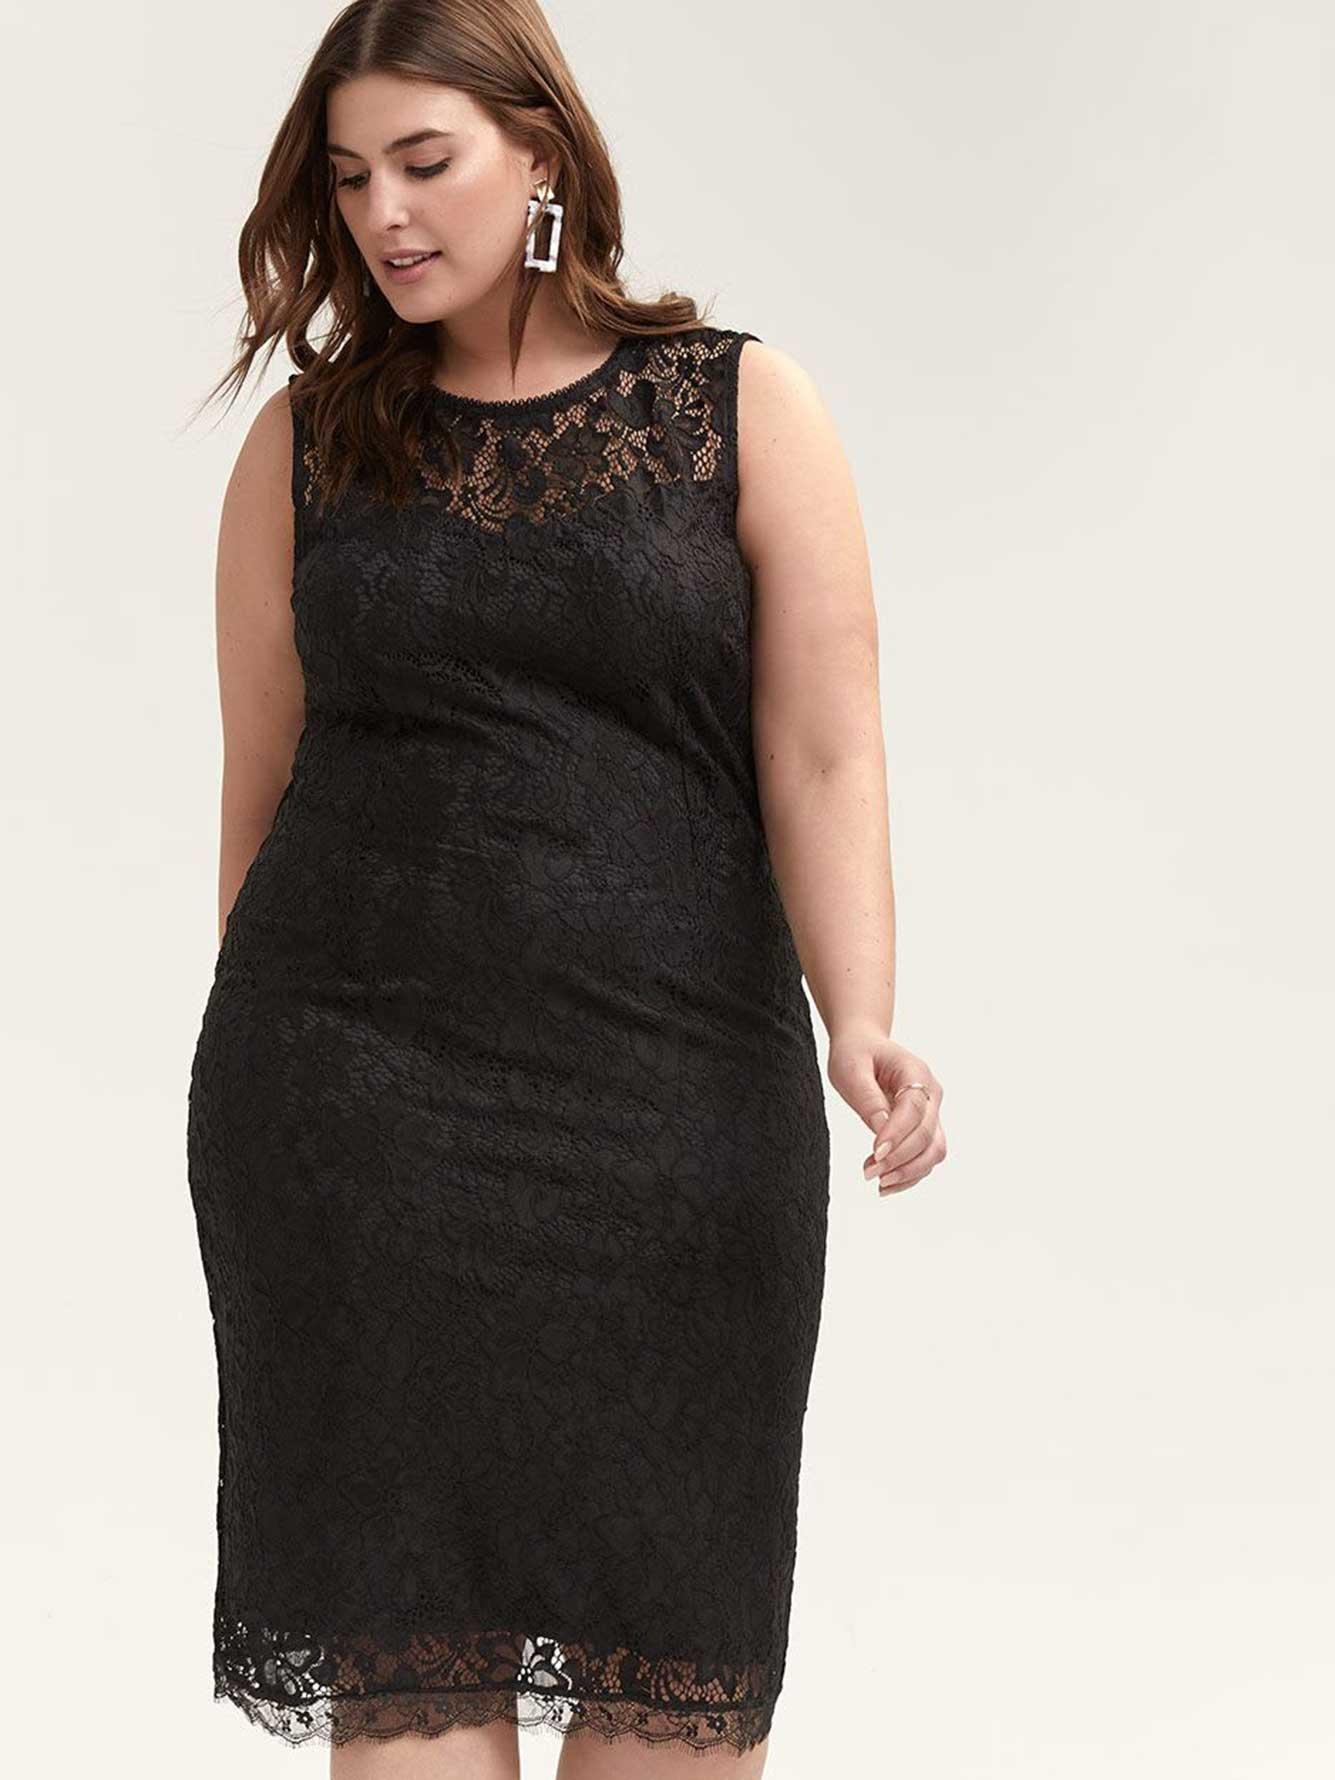 Black Lace Dress by Penningtons